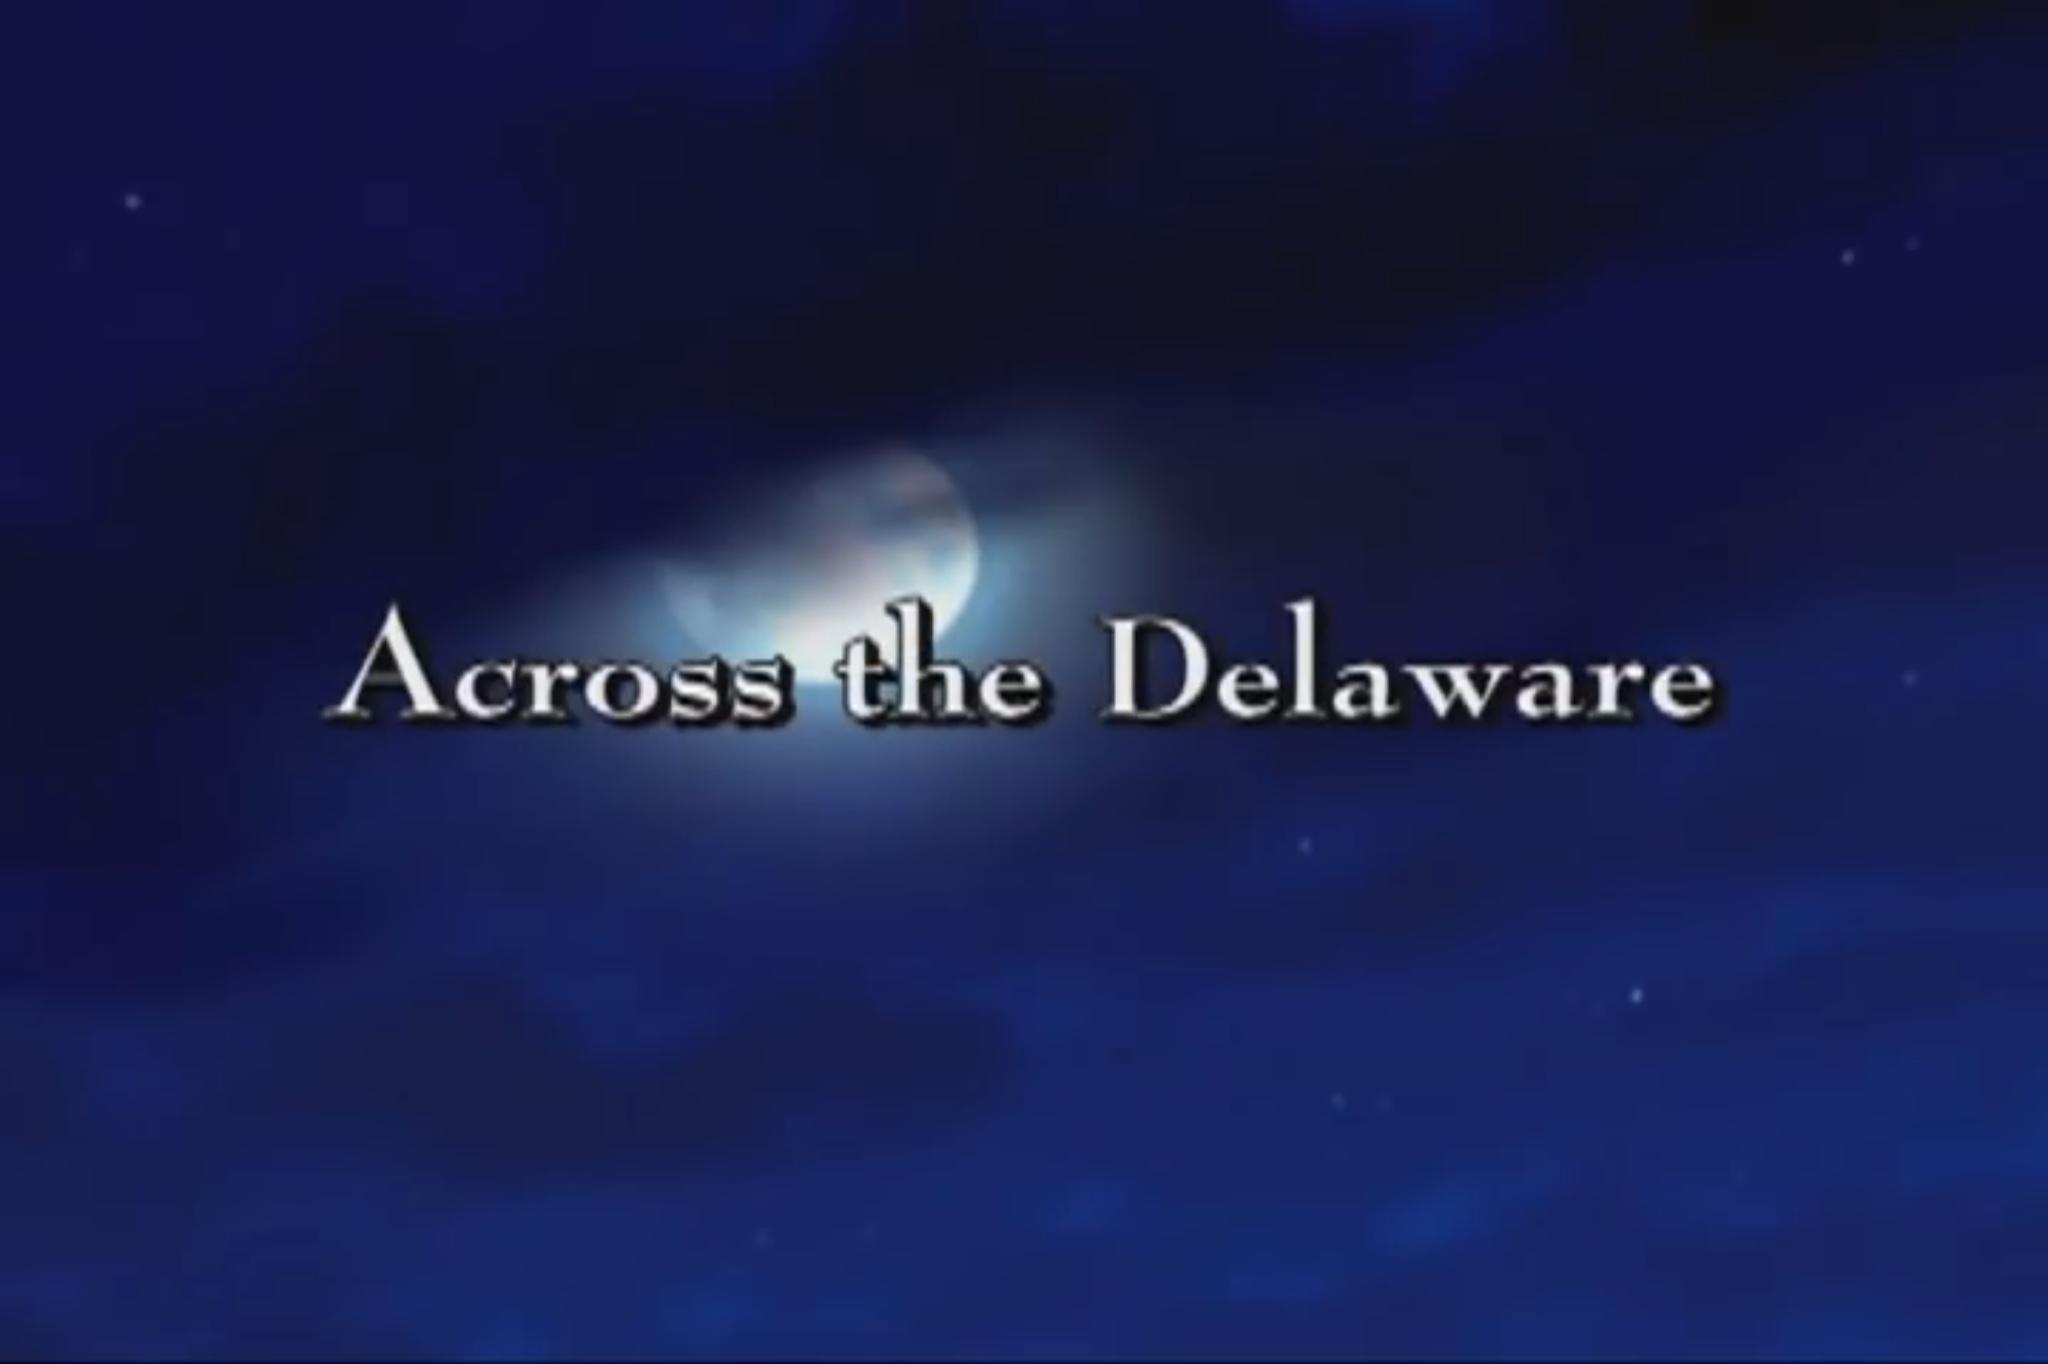 Across the Delaware